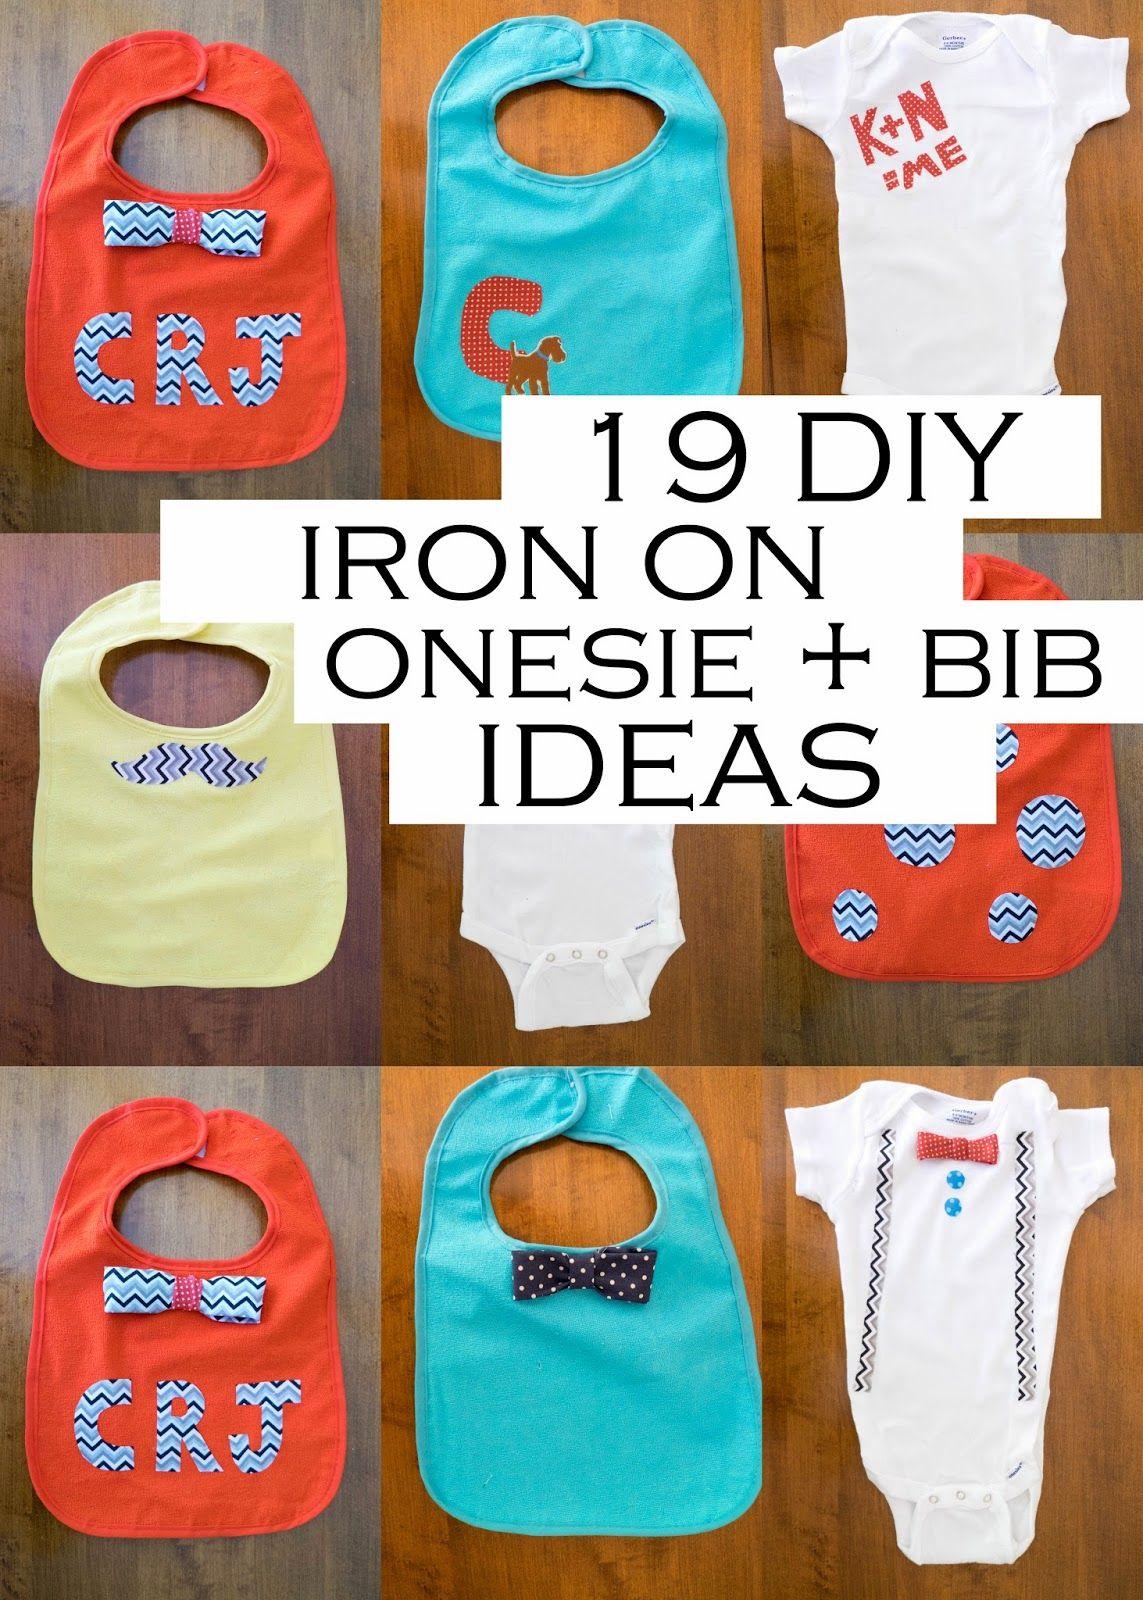 19 Iron On Baby Onesie + Bib Ideas | Baby bibs, Onesies ...